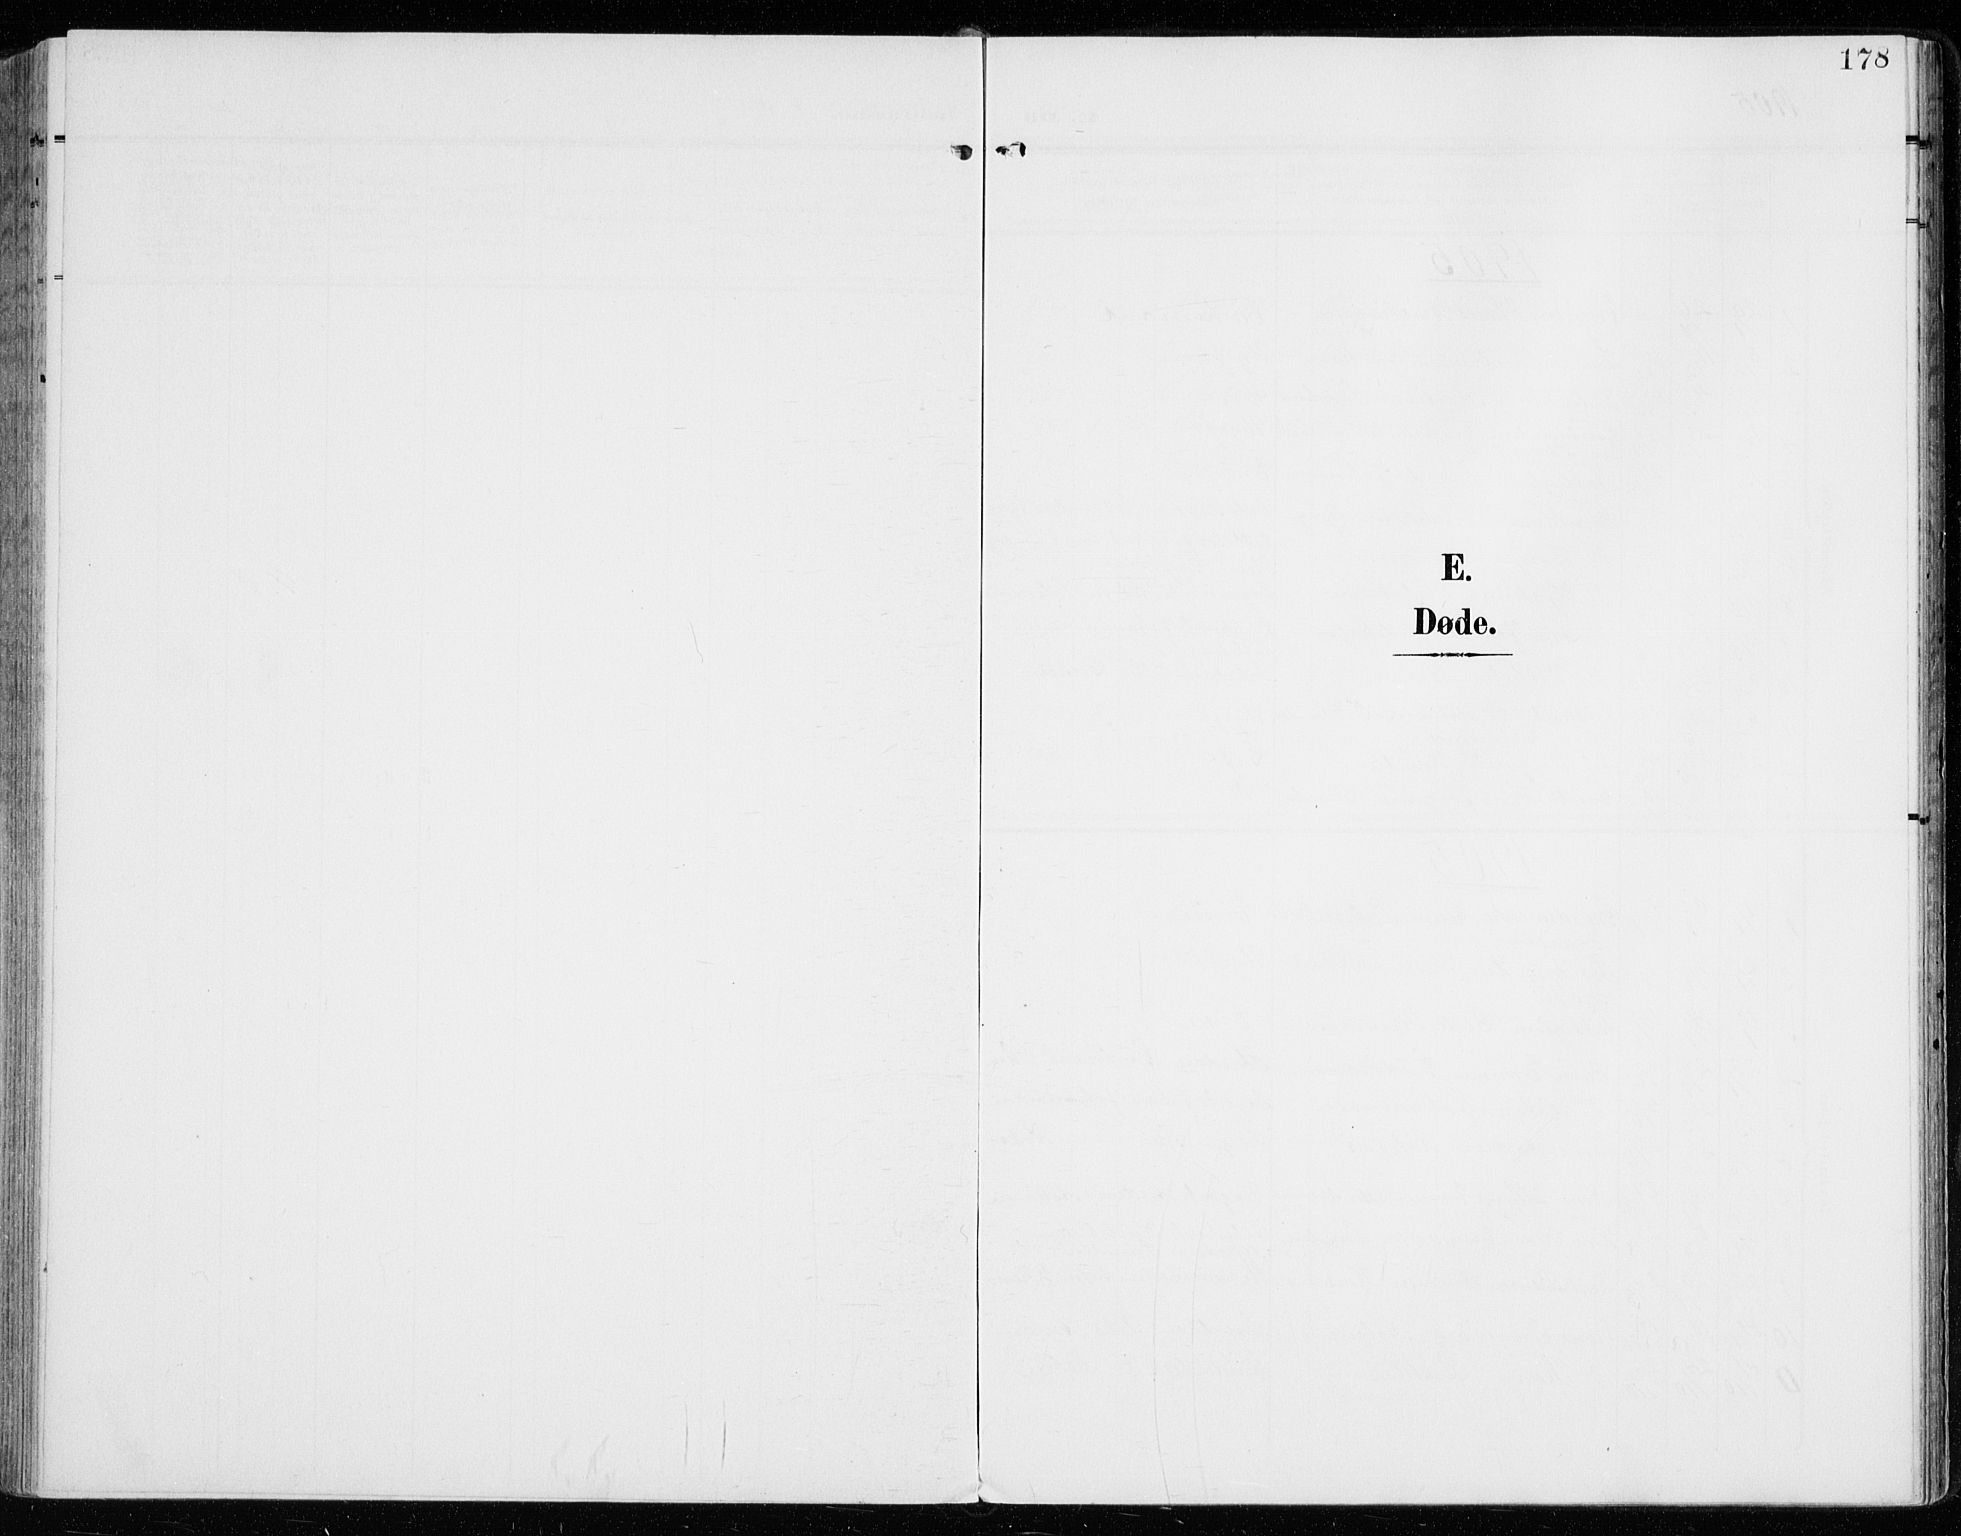 SAH, Vardal prestekontor, H/Ha/Haa/L0016: Ministerialbok nr. 16, 1904-1916, s. 178